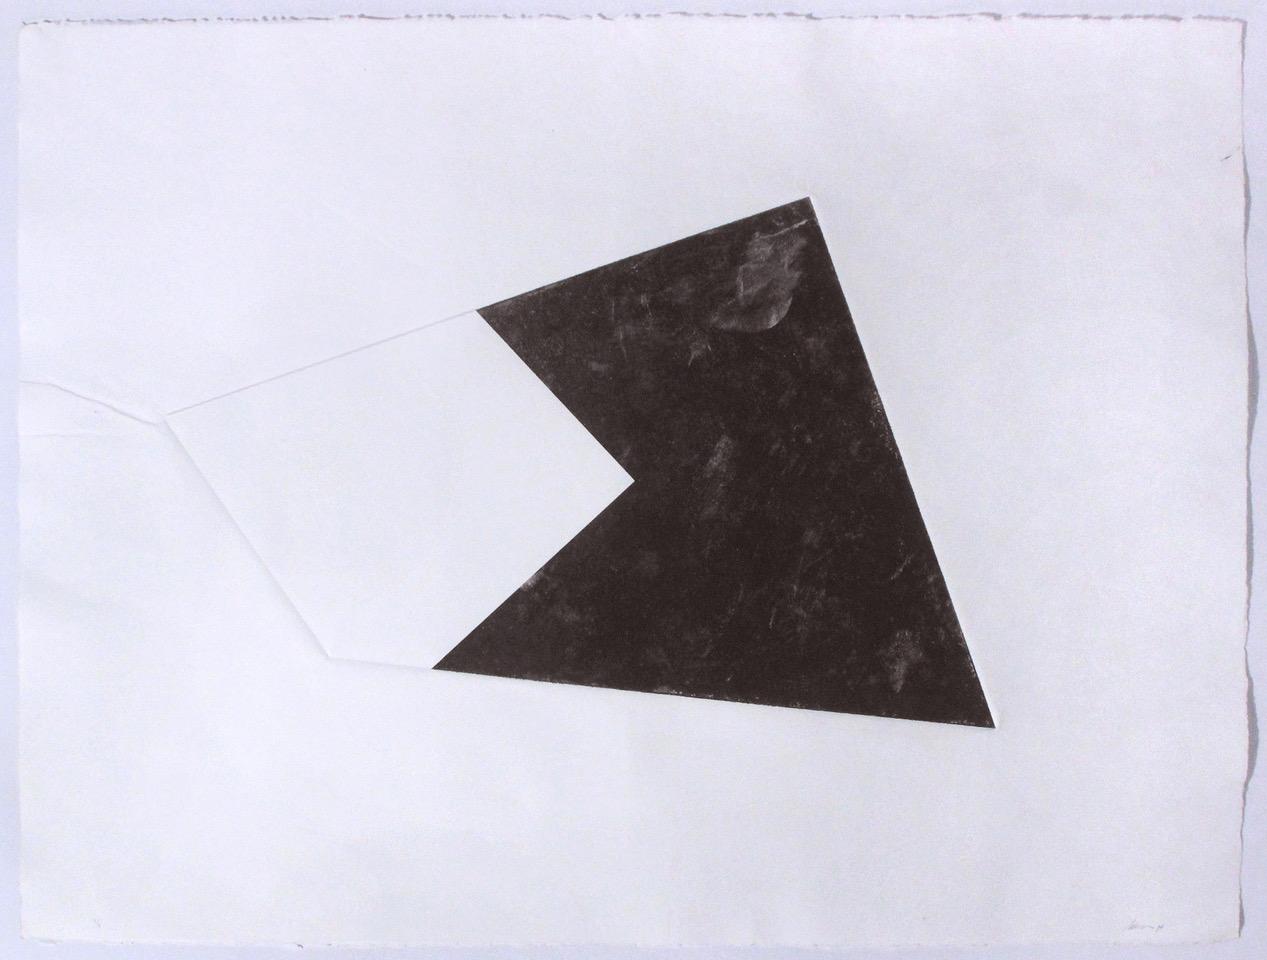 Luisa Duarte, Empty site, 2014, Monotype on paper, 30 x 22 x 0 in.